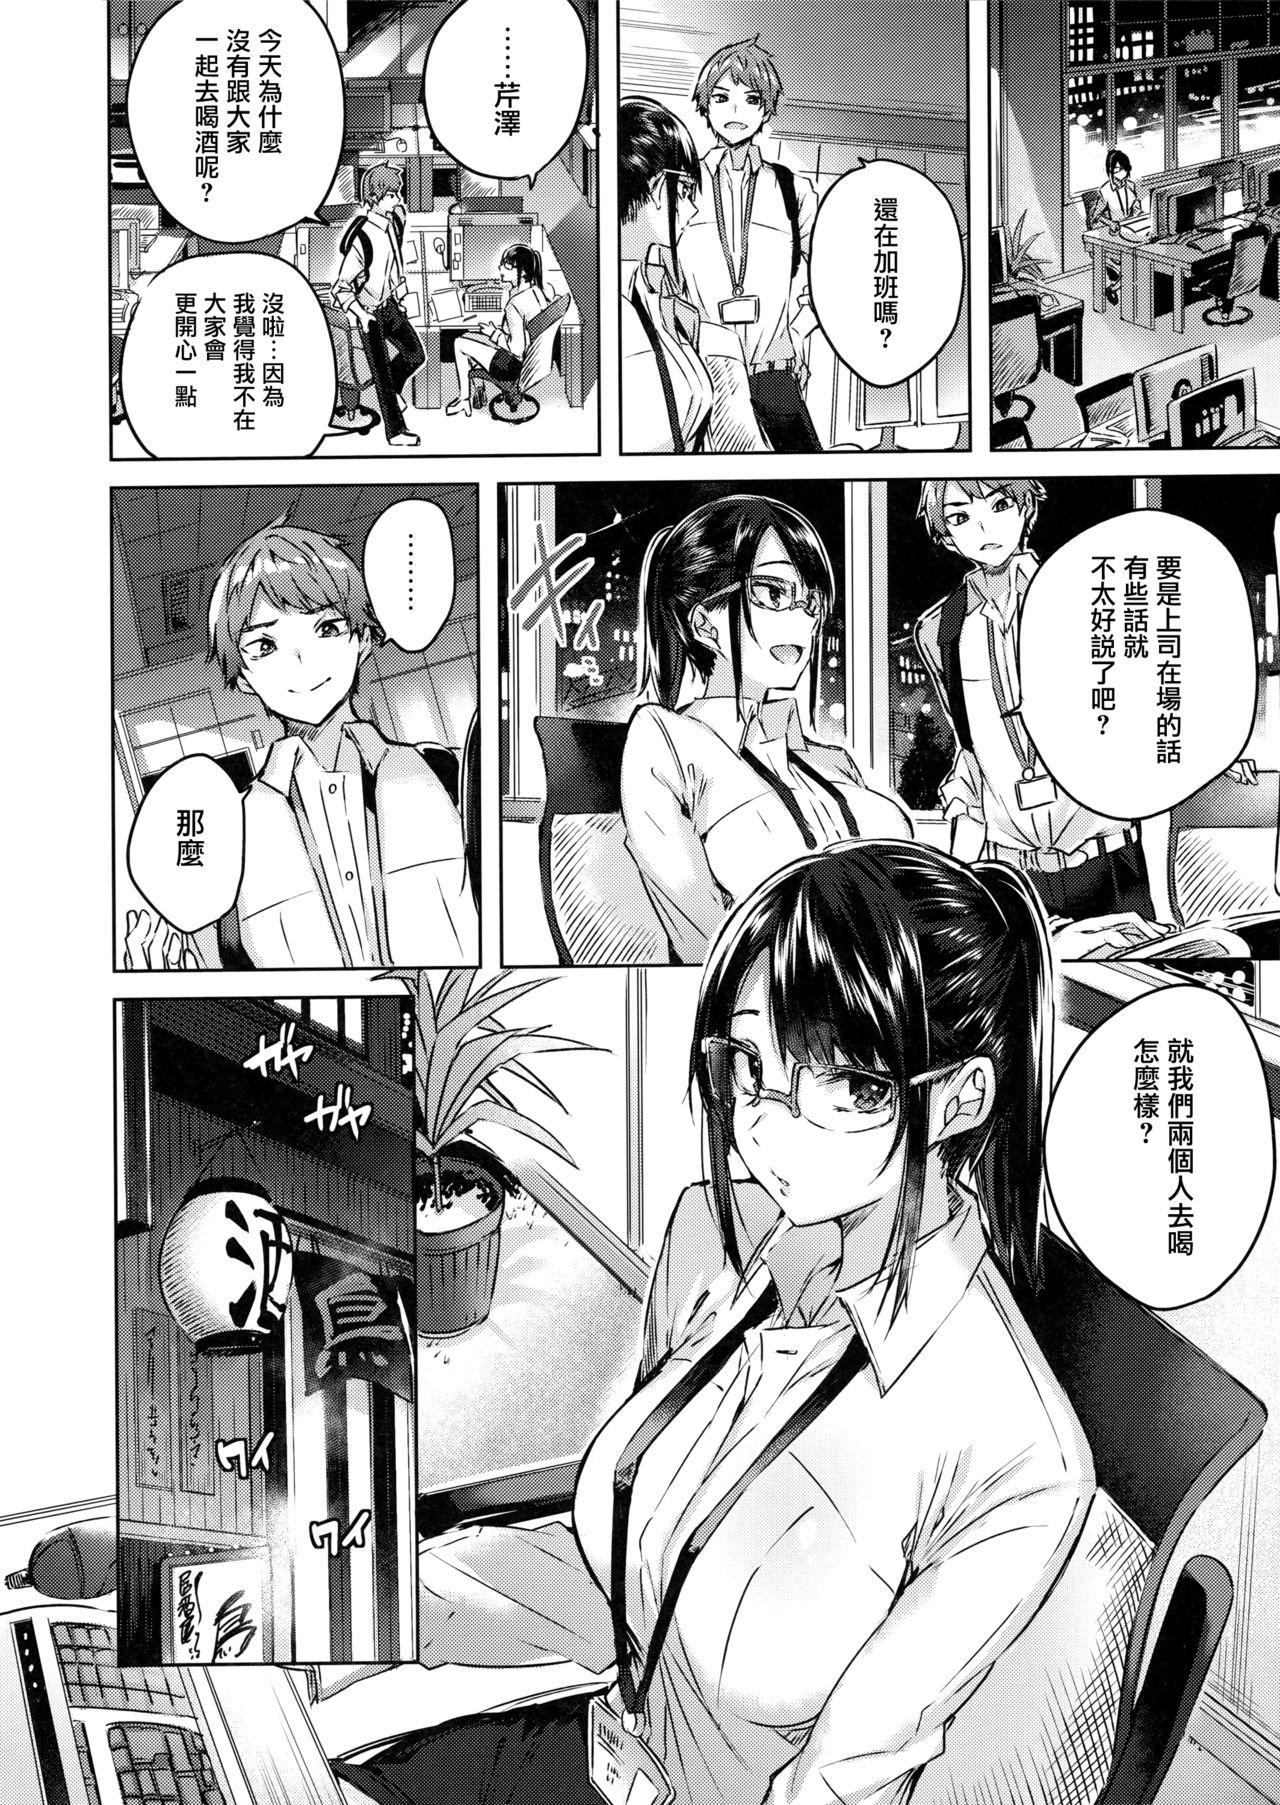 [Kakao] Nakadashi Strike! - Winning strike! Ch. 1-2  [Chinese] [兔司姬漢化組] 27